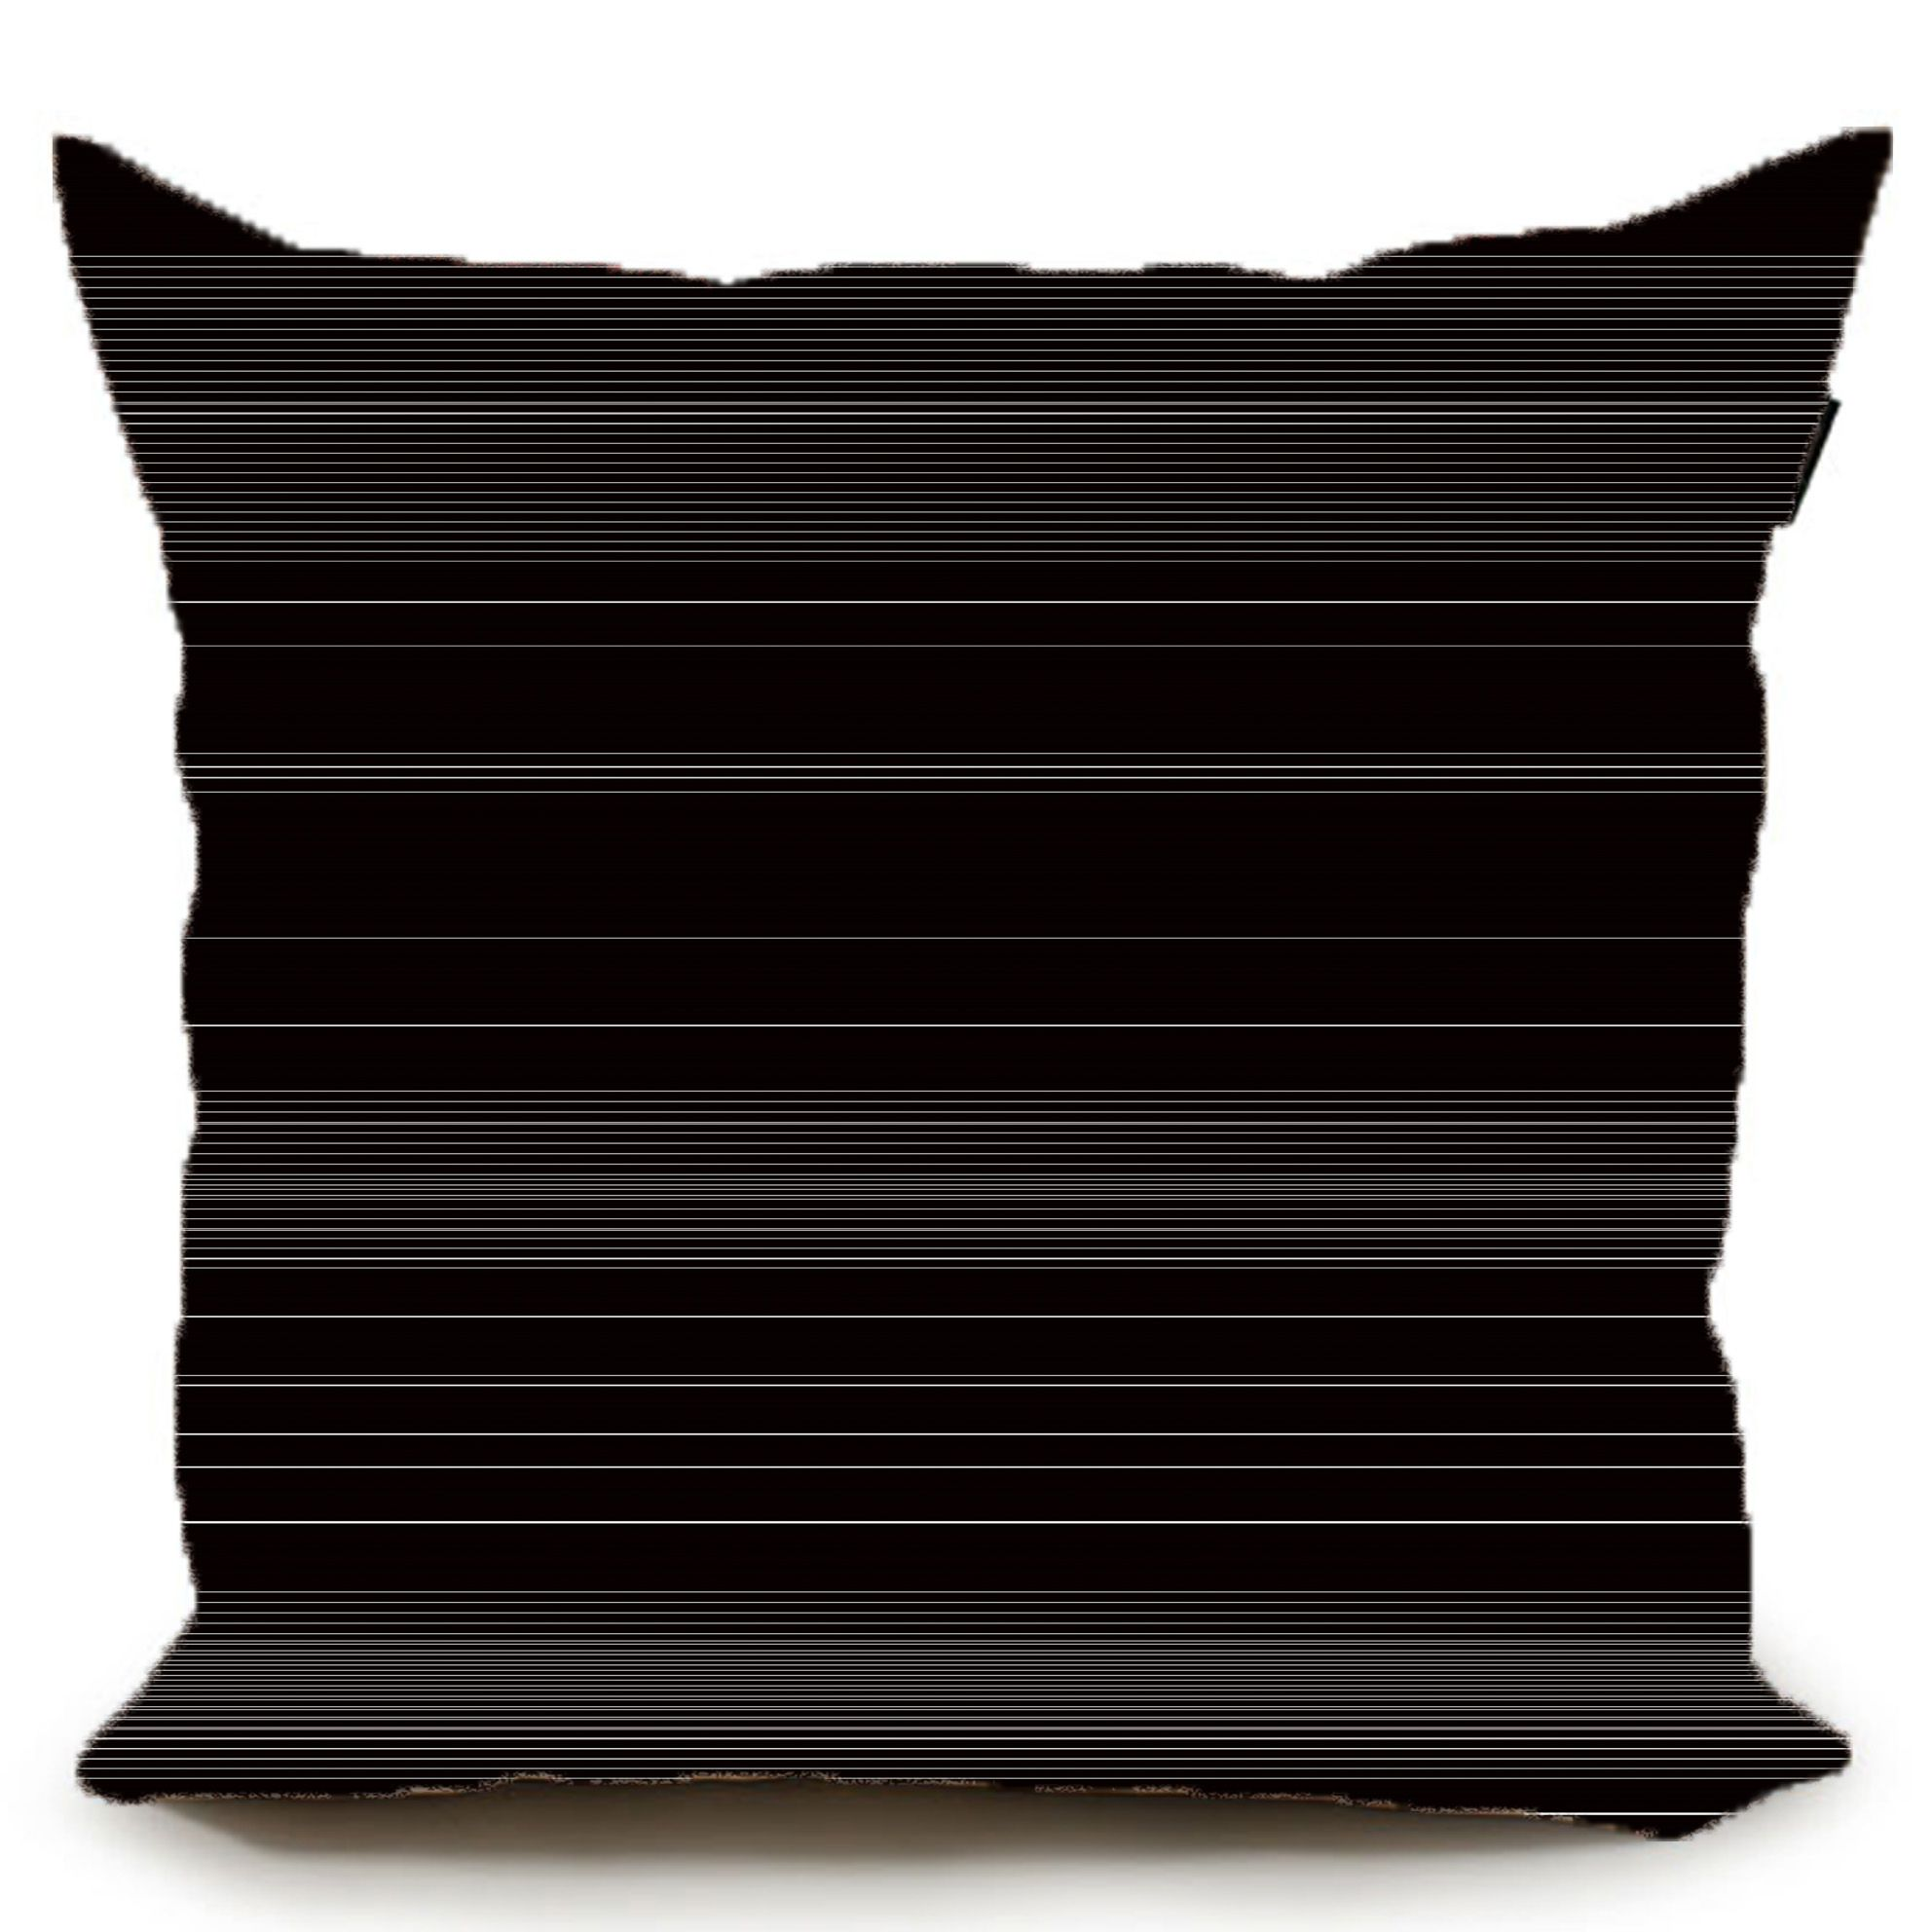 Deco design cushion design collection pinterest